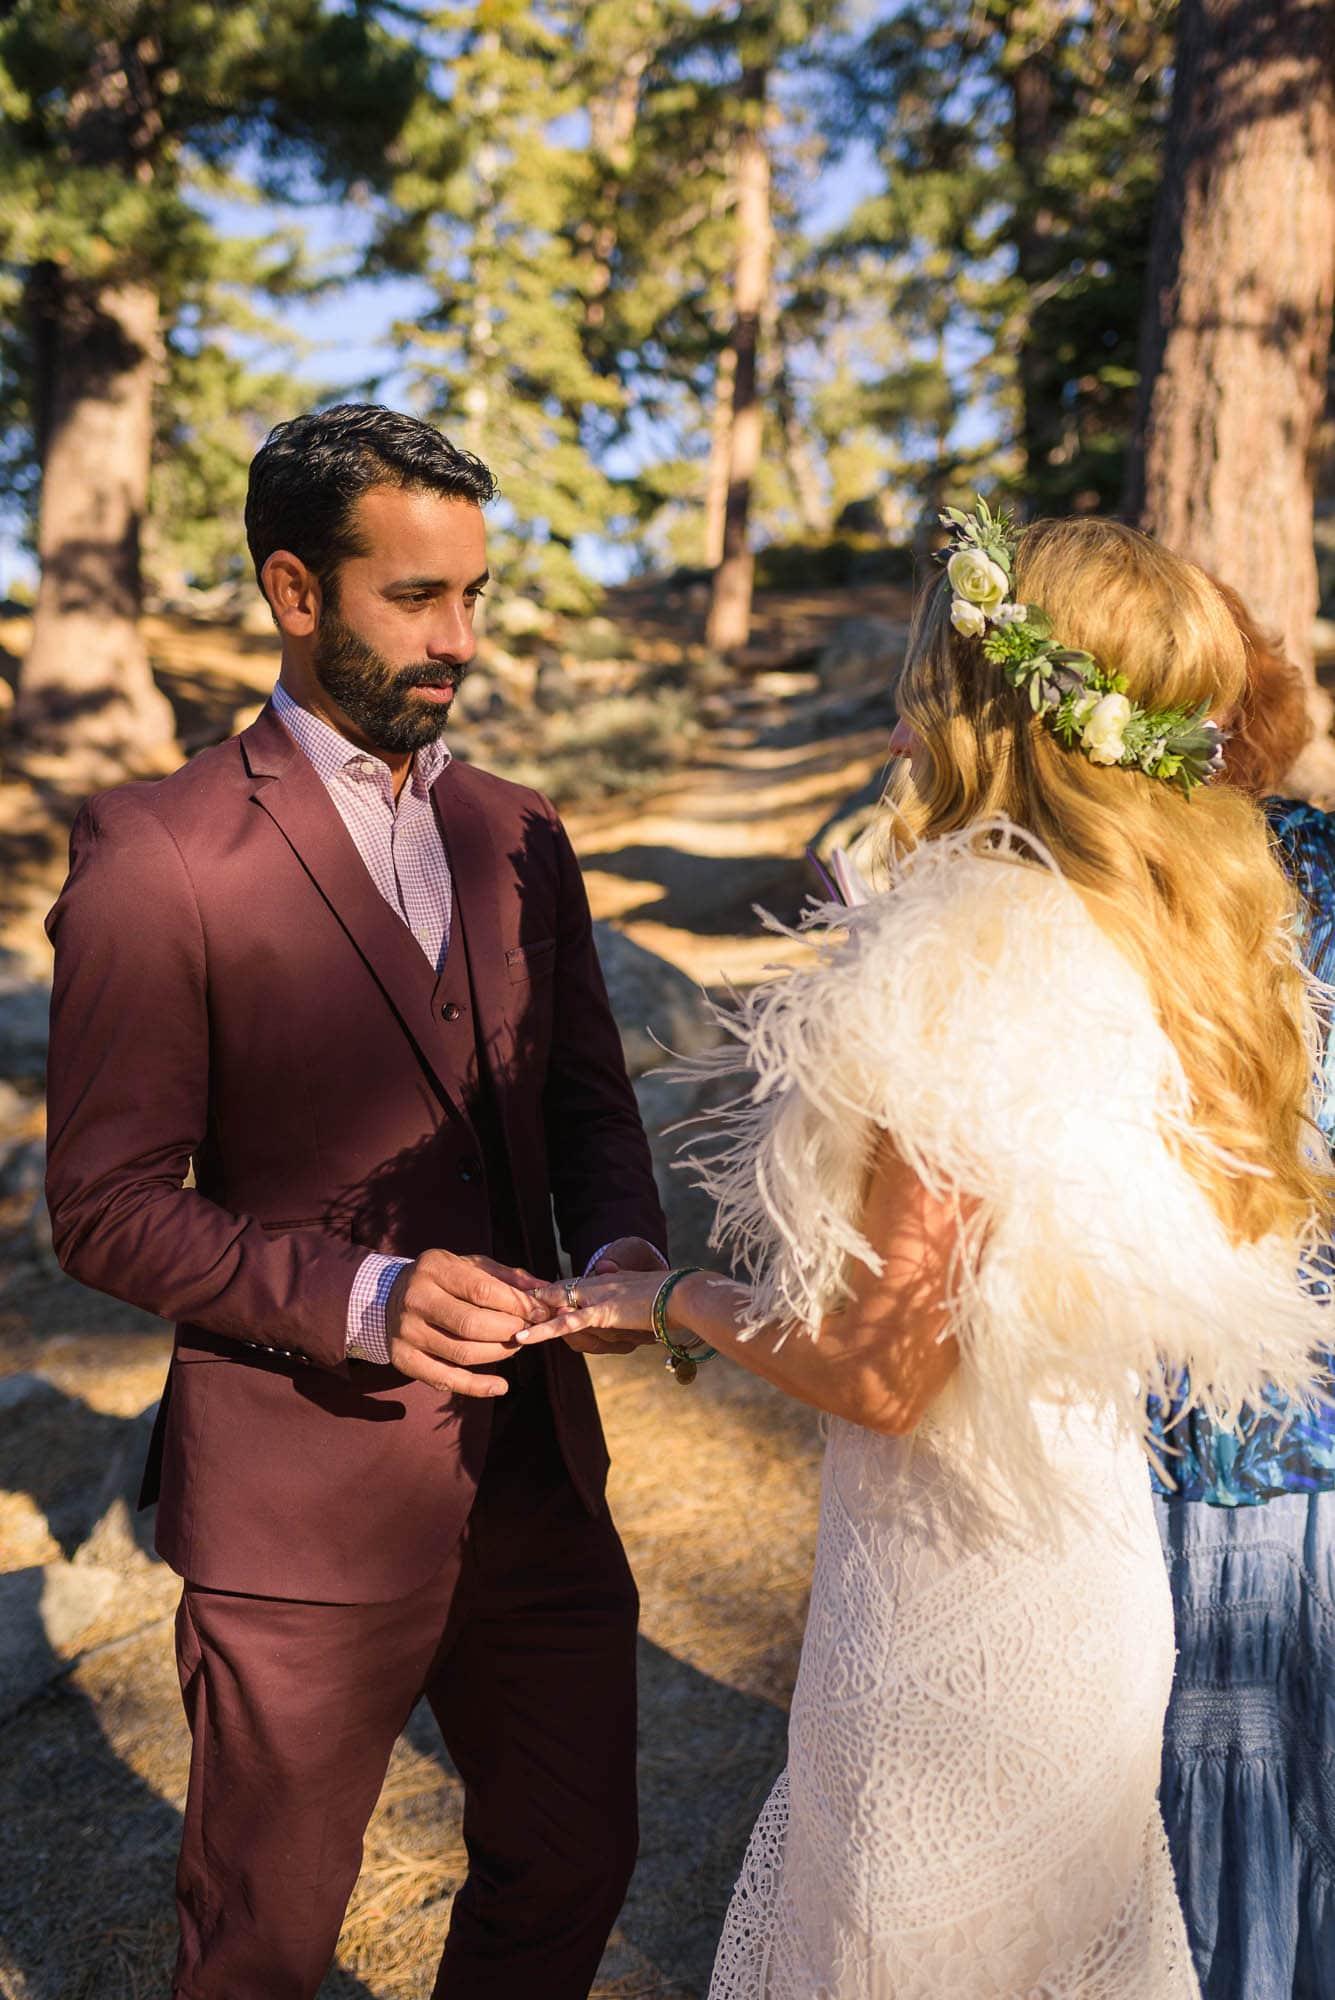 024_Alan_and_Heidi_Wedding_Natalie_Mike